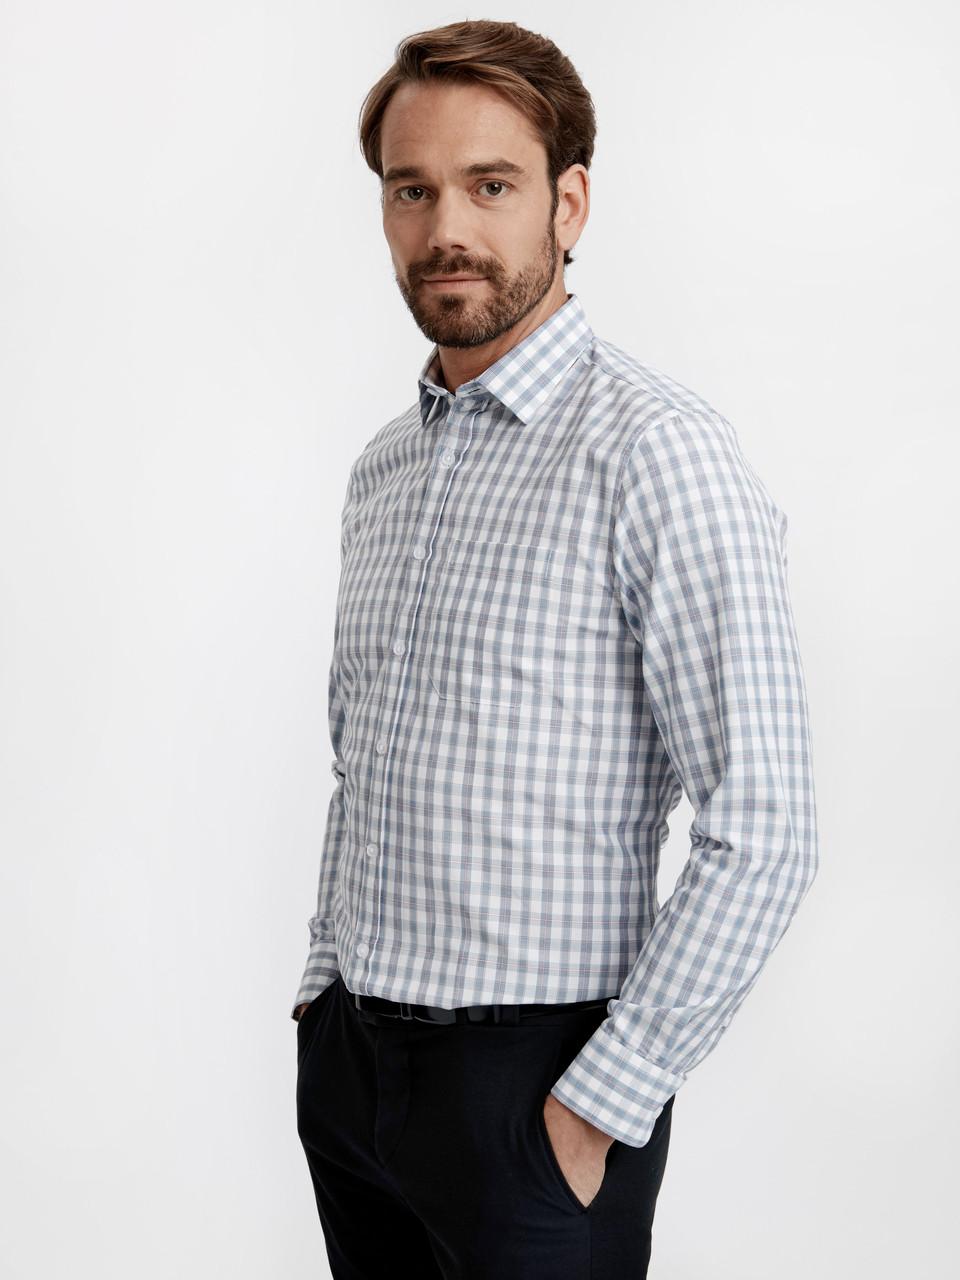 Мужская рубашка LC Waikiki / ЛС Вайкики в голубую клетку и красную клетку